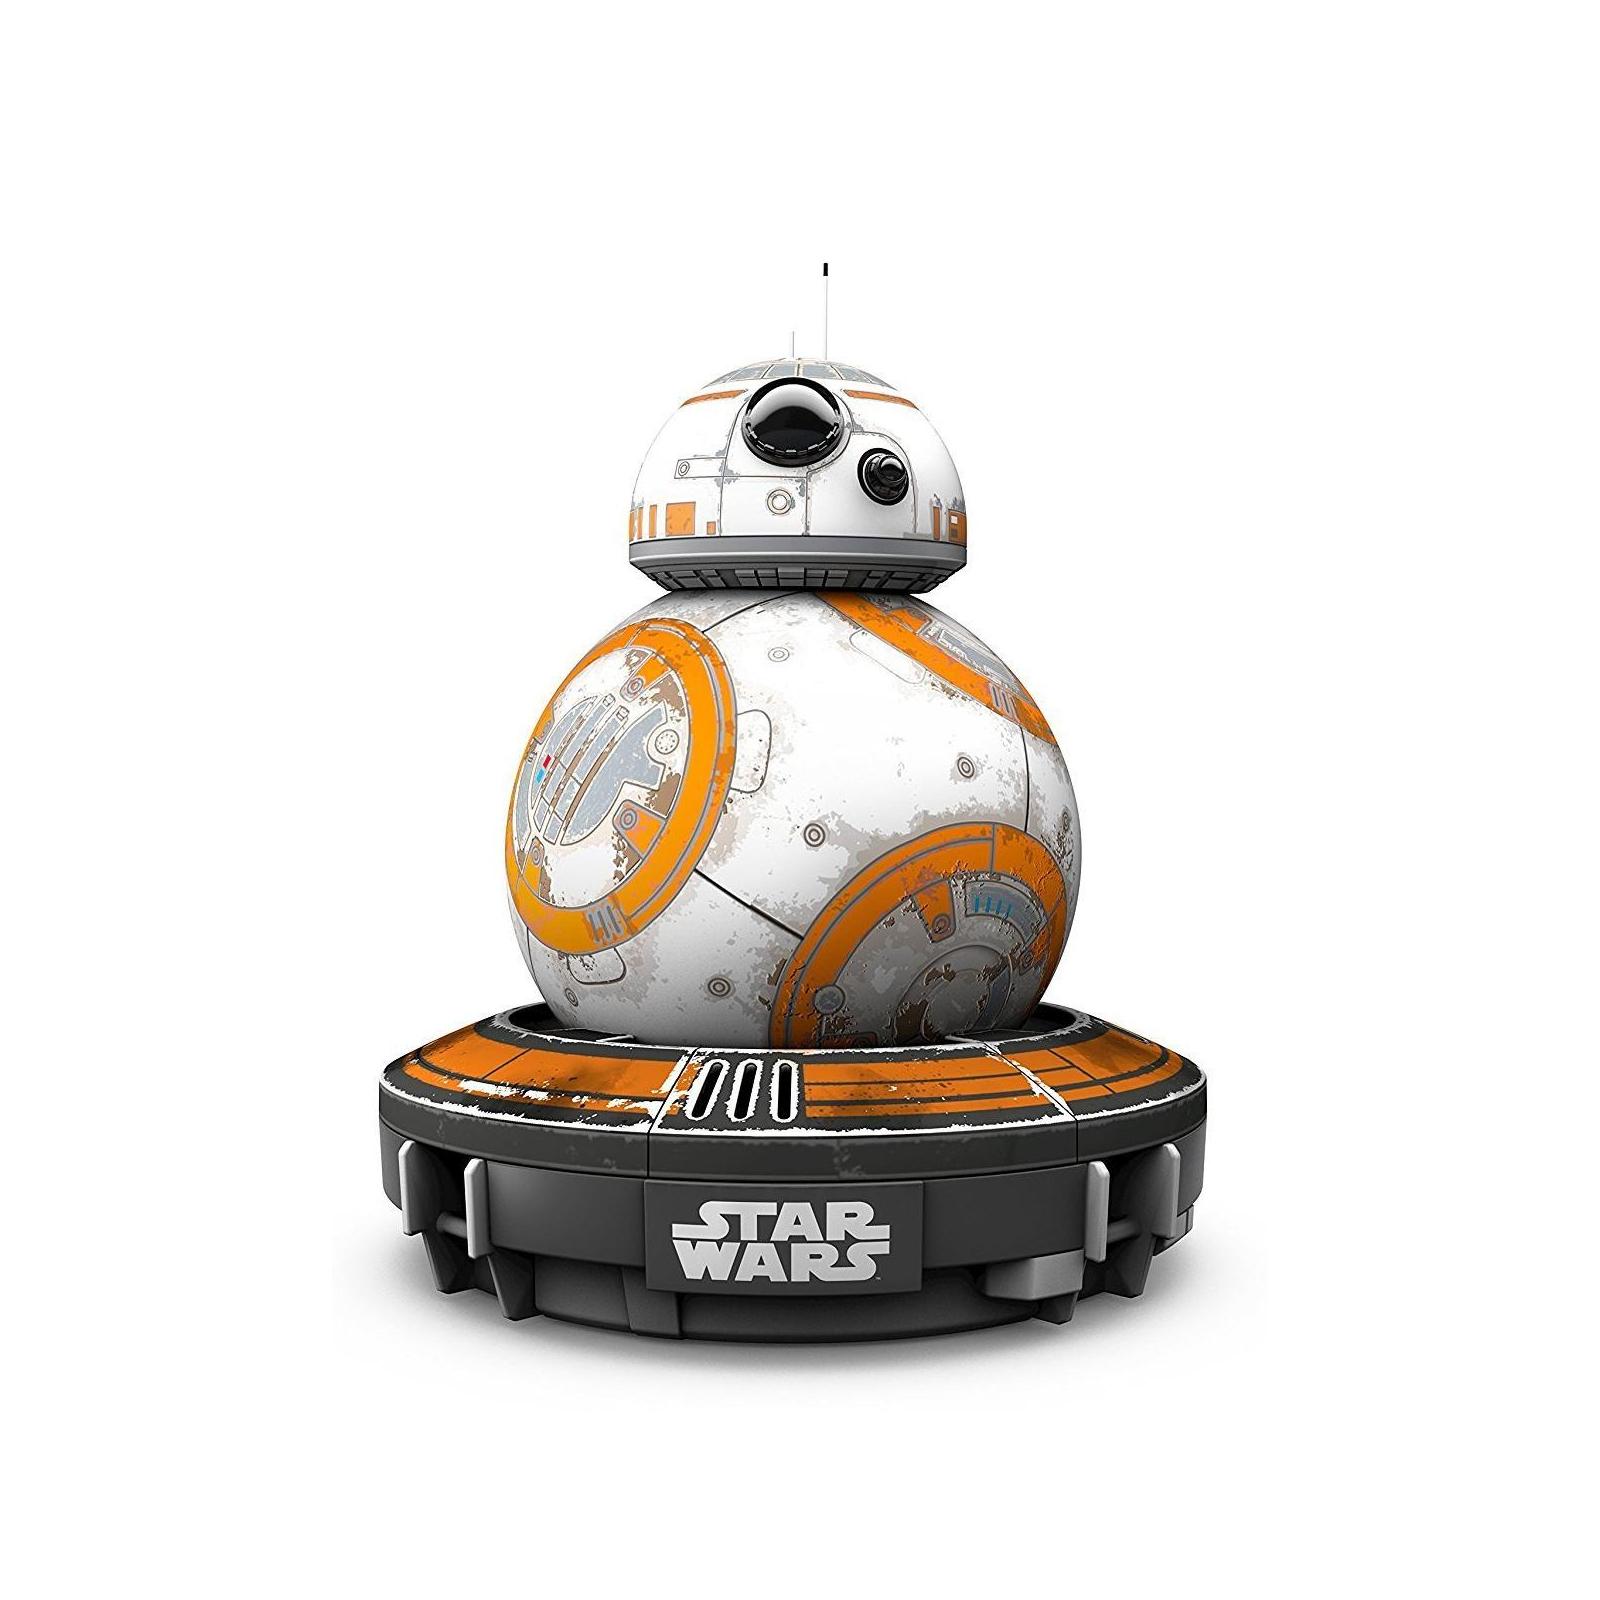 Робот Sphero BB-8 Special Edition with Force Band (322384) изображение 4